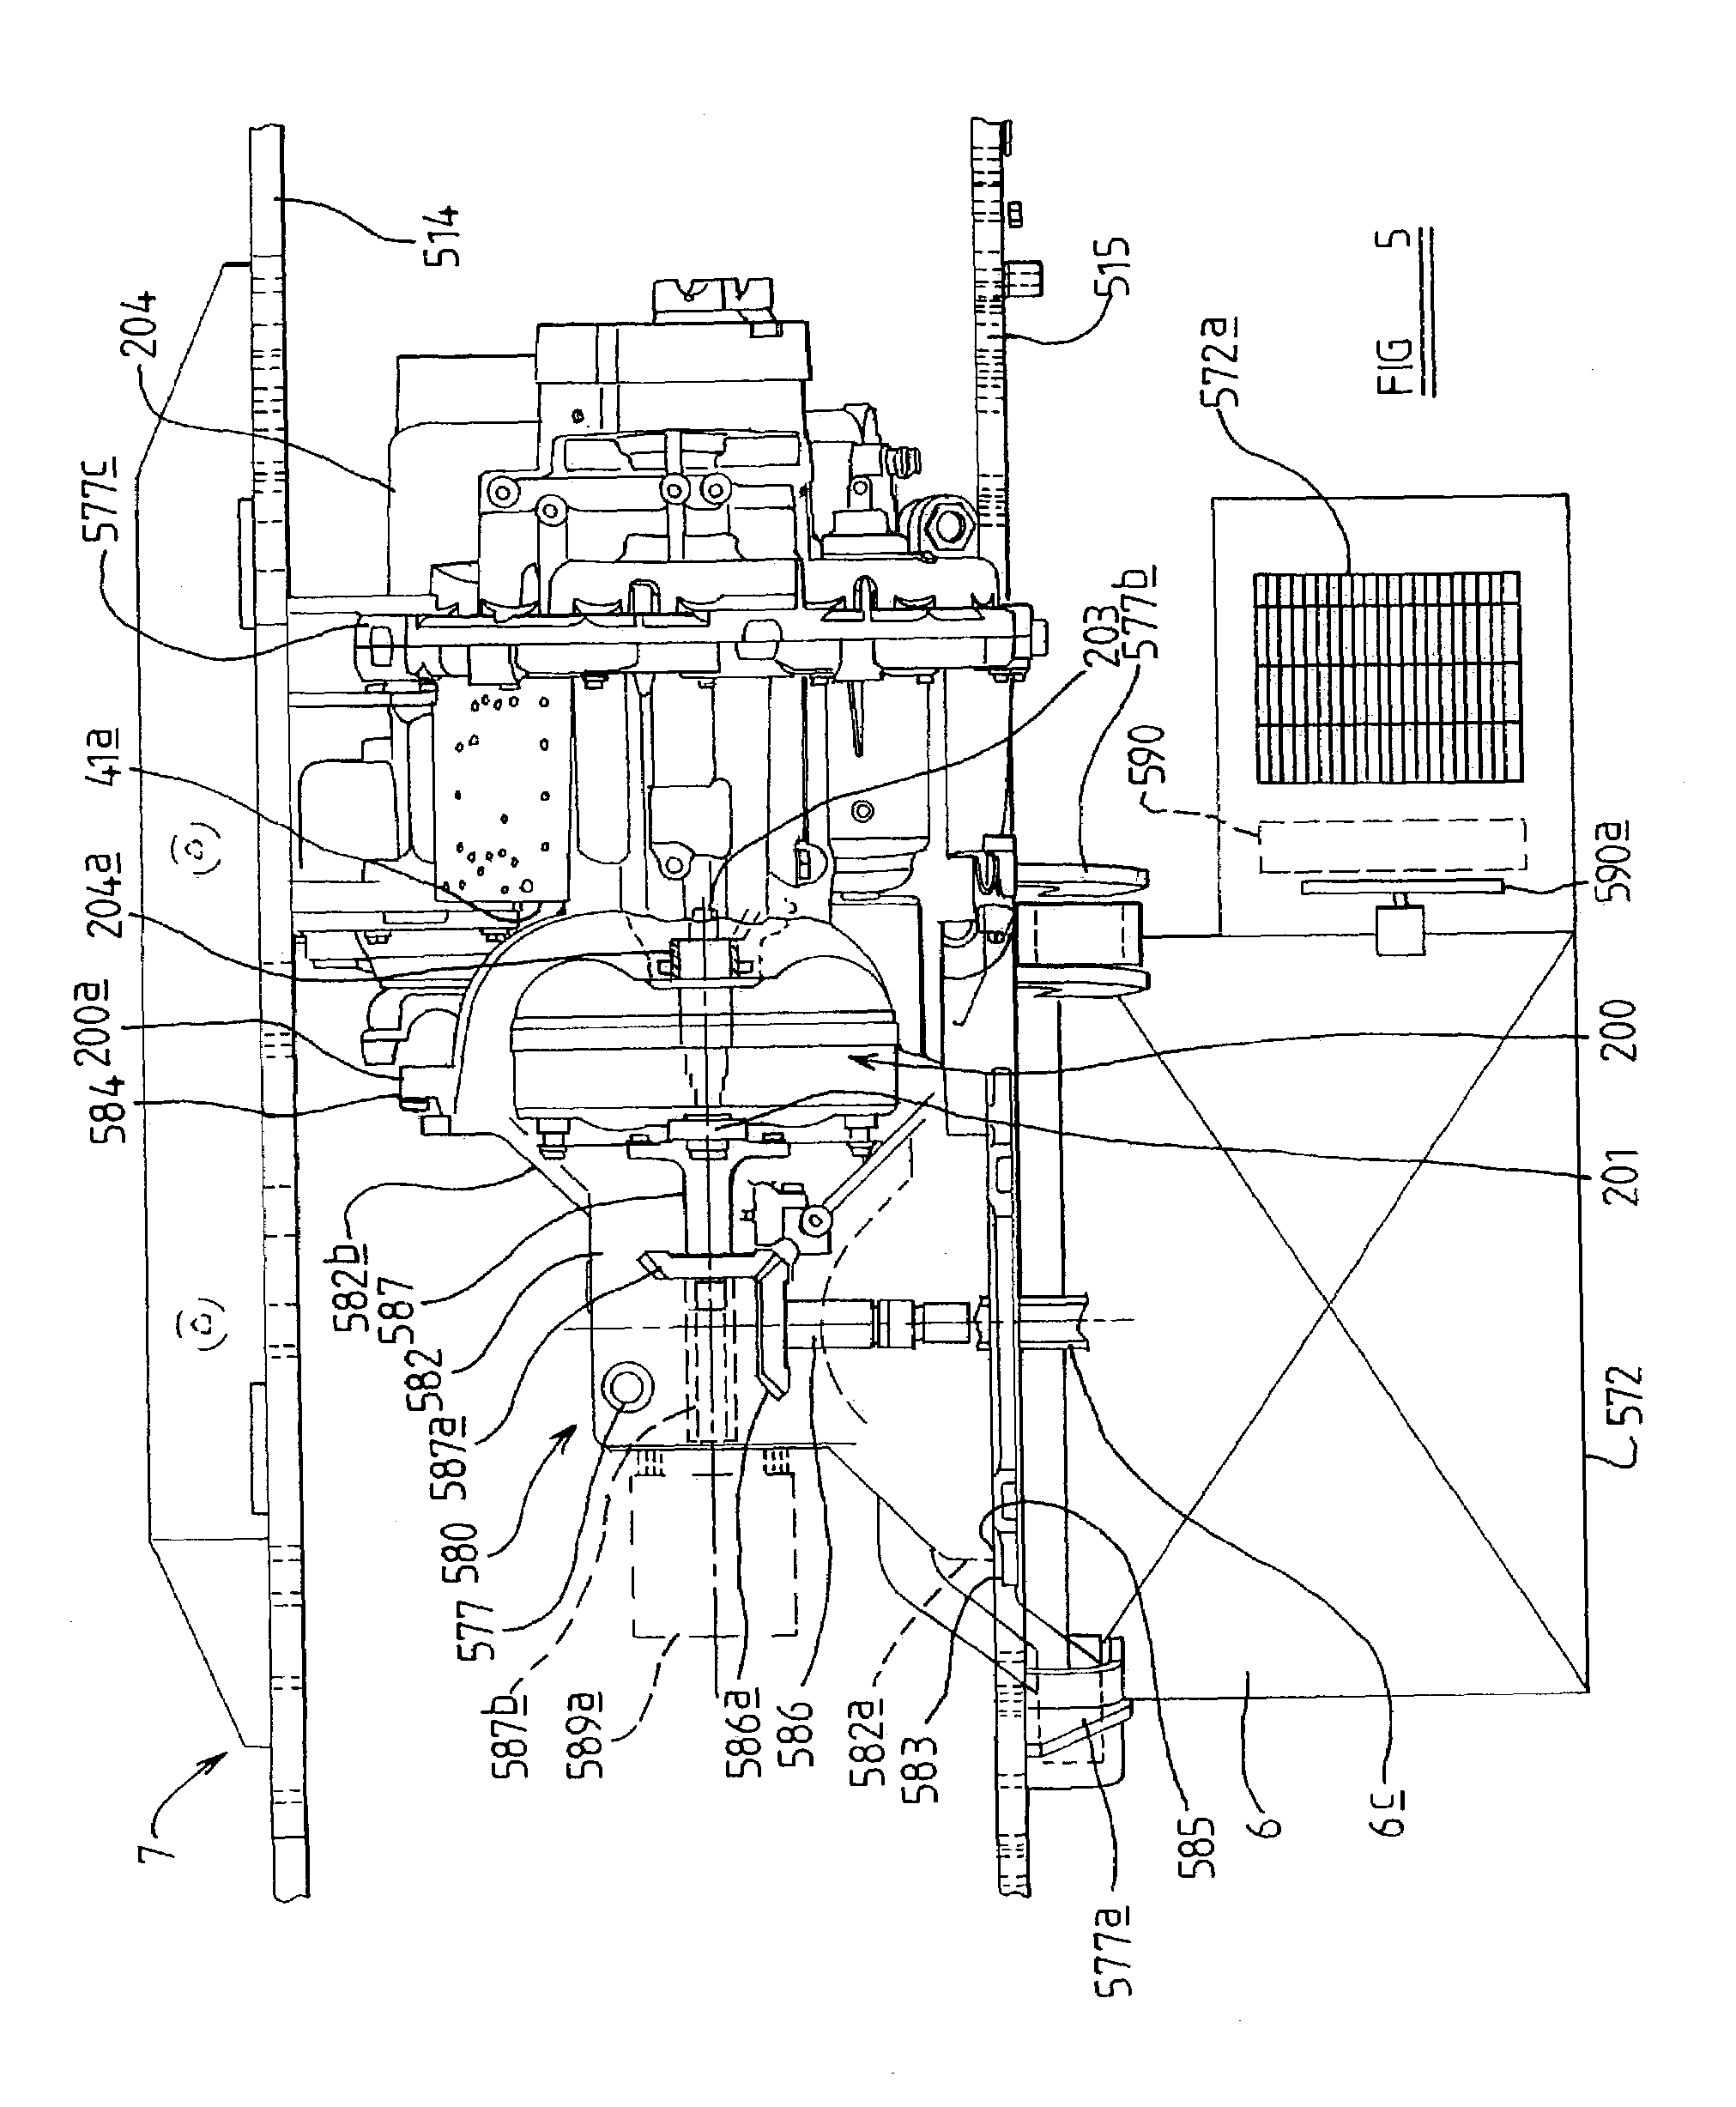 Jcb Backhoe Wiring Diagram 1994 Jeep Cj5 Headlight Switch Wiring – Jcb Backhoe Wiring Diagram 1994